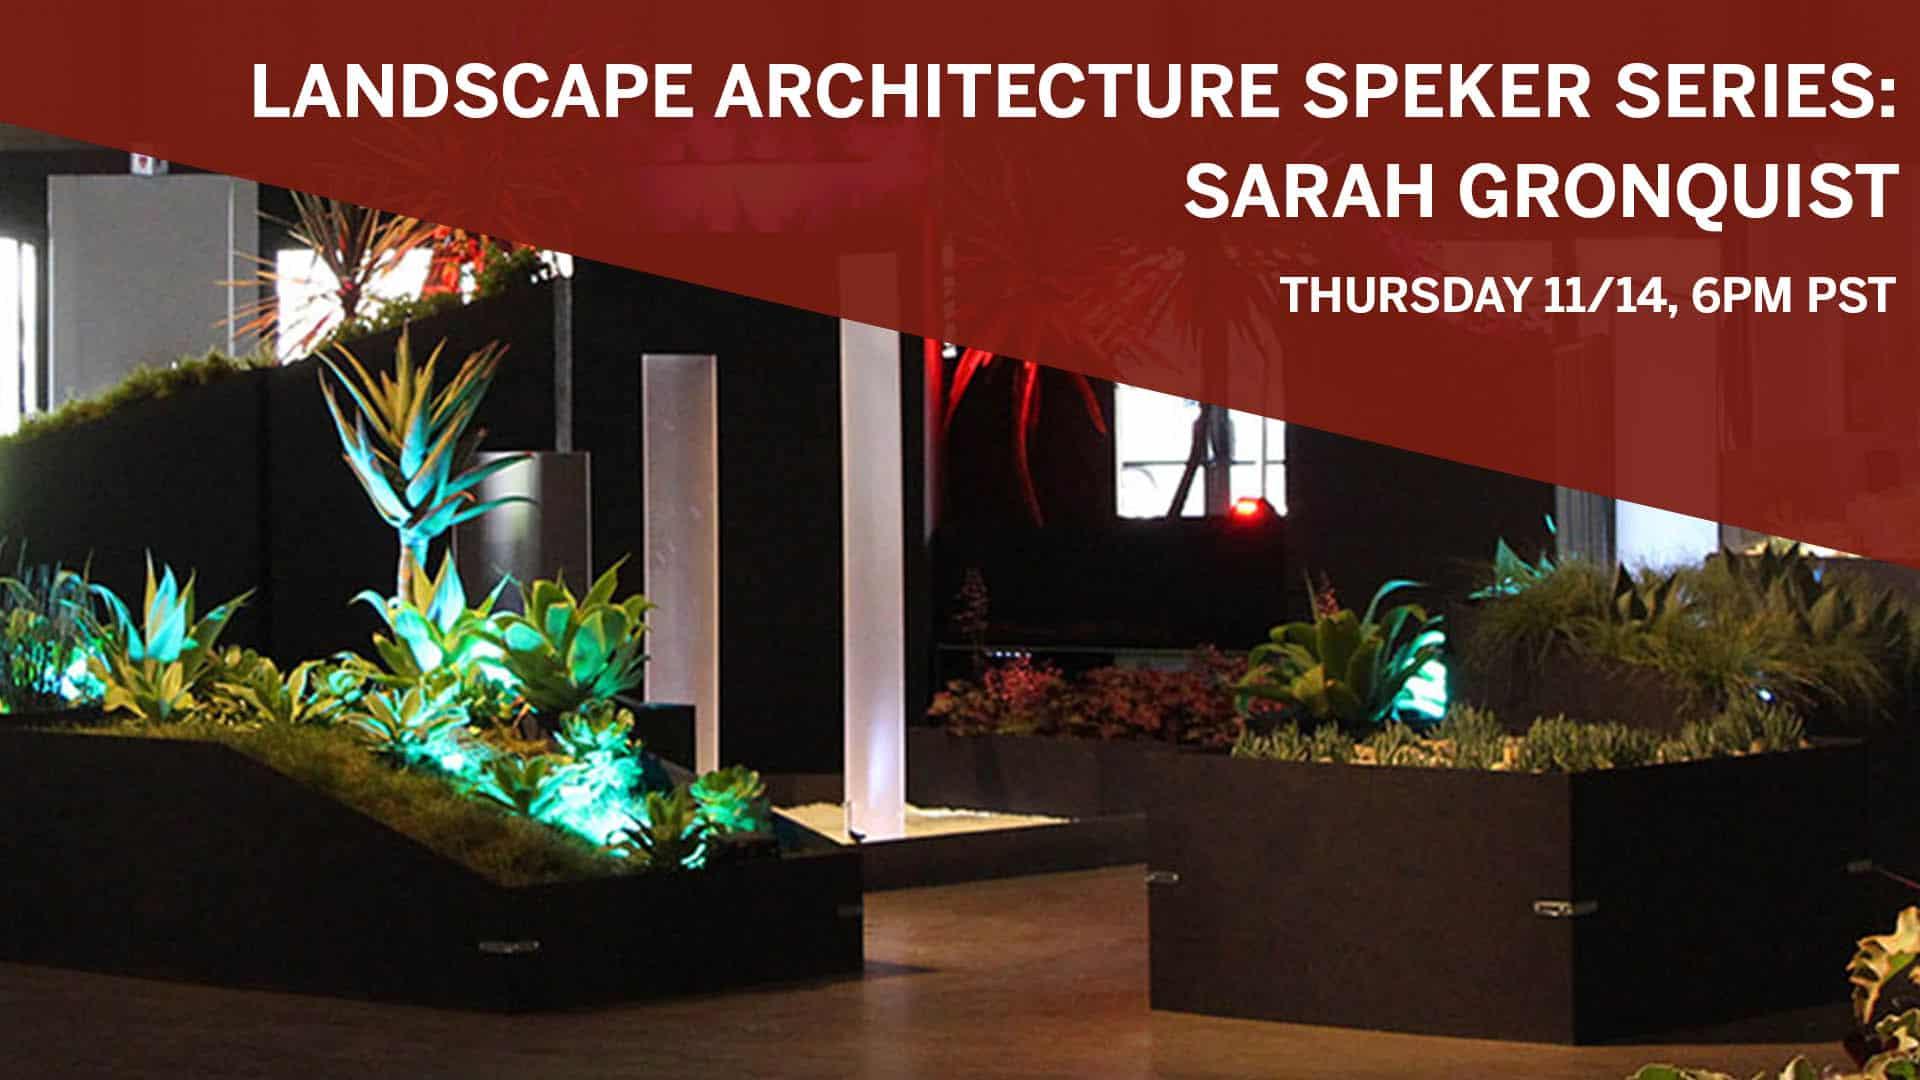 Landscape Architecture Speaker Series: Sarah Gronquist